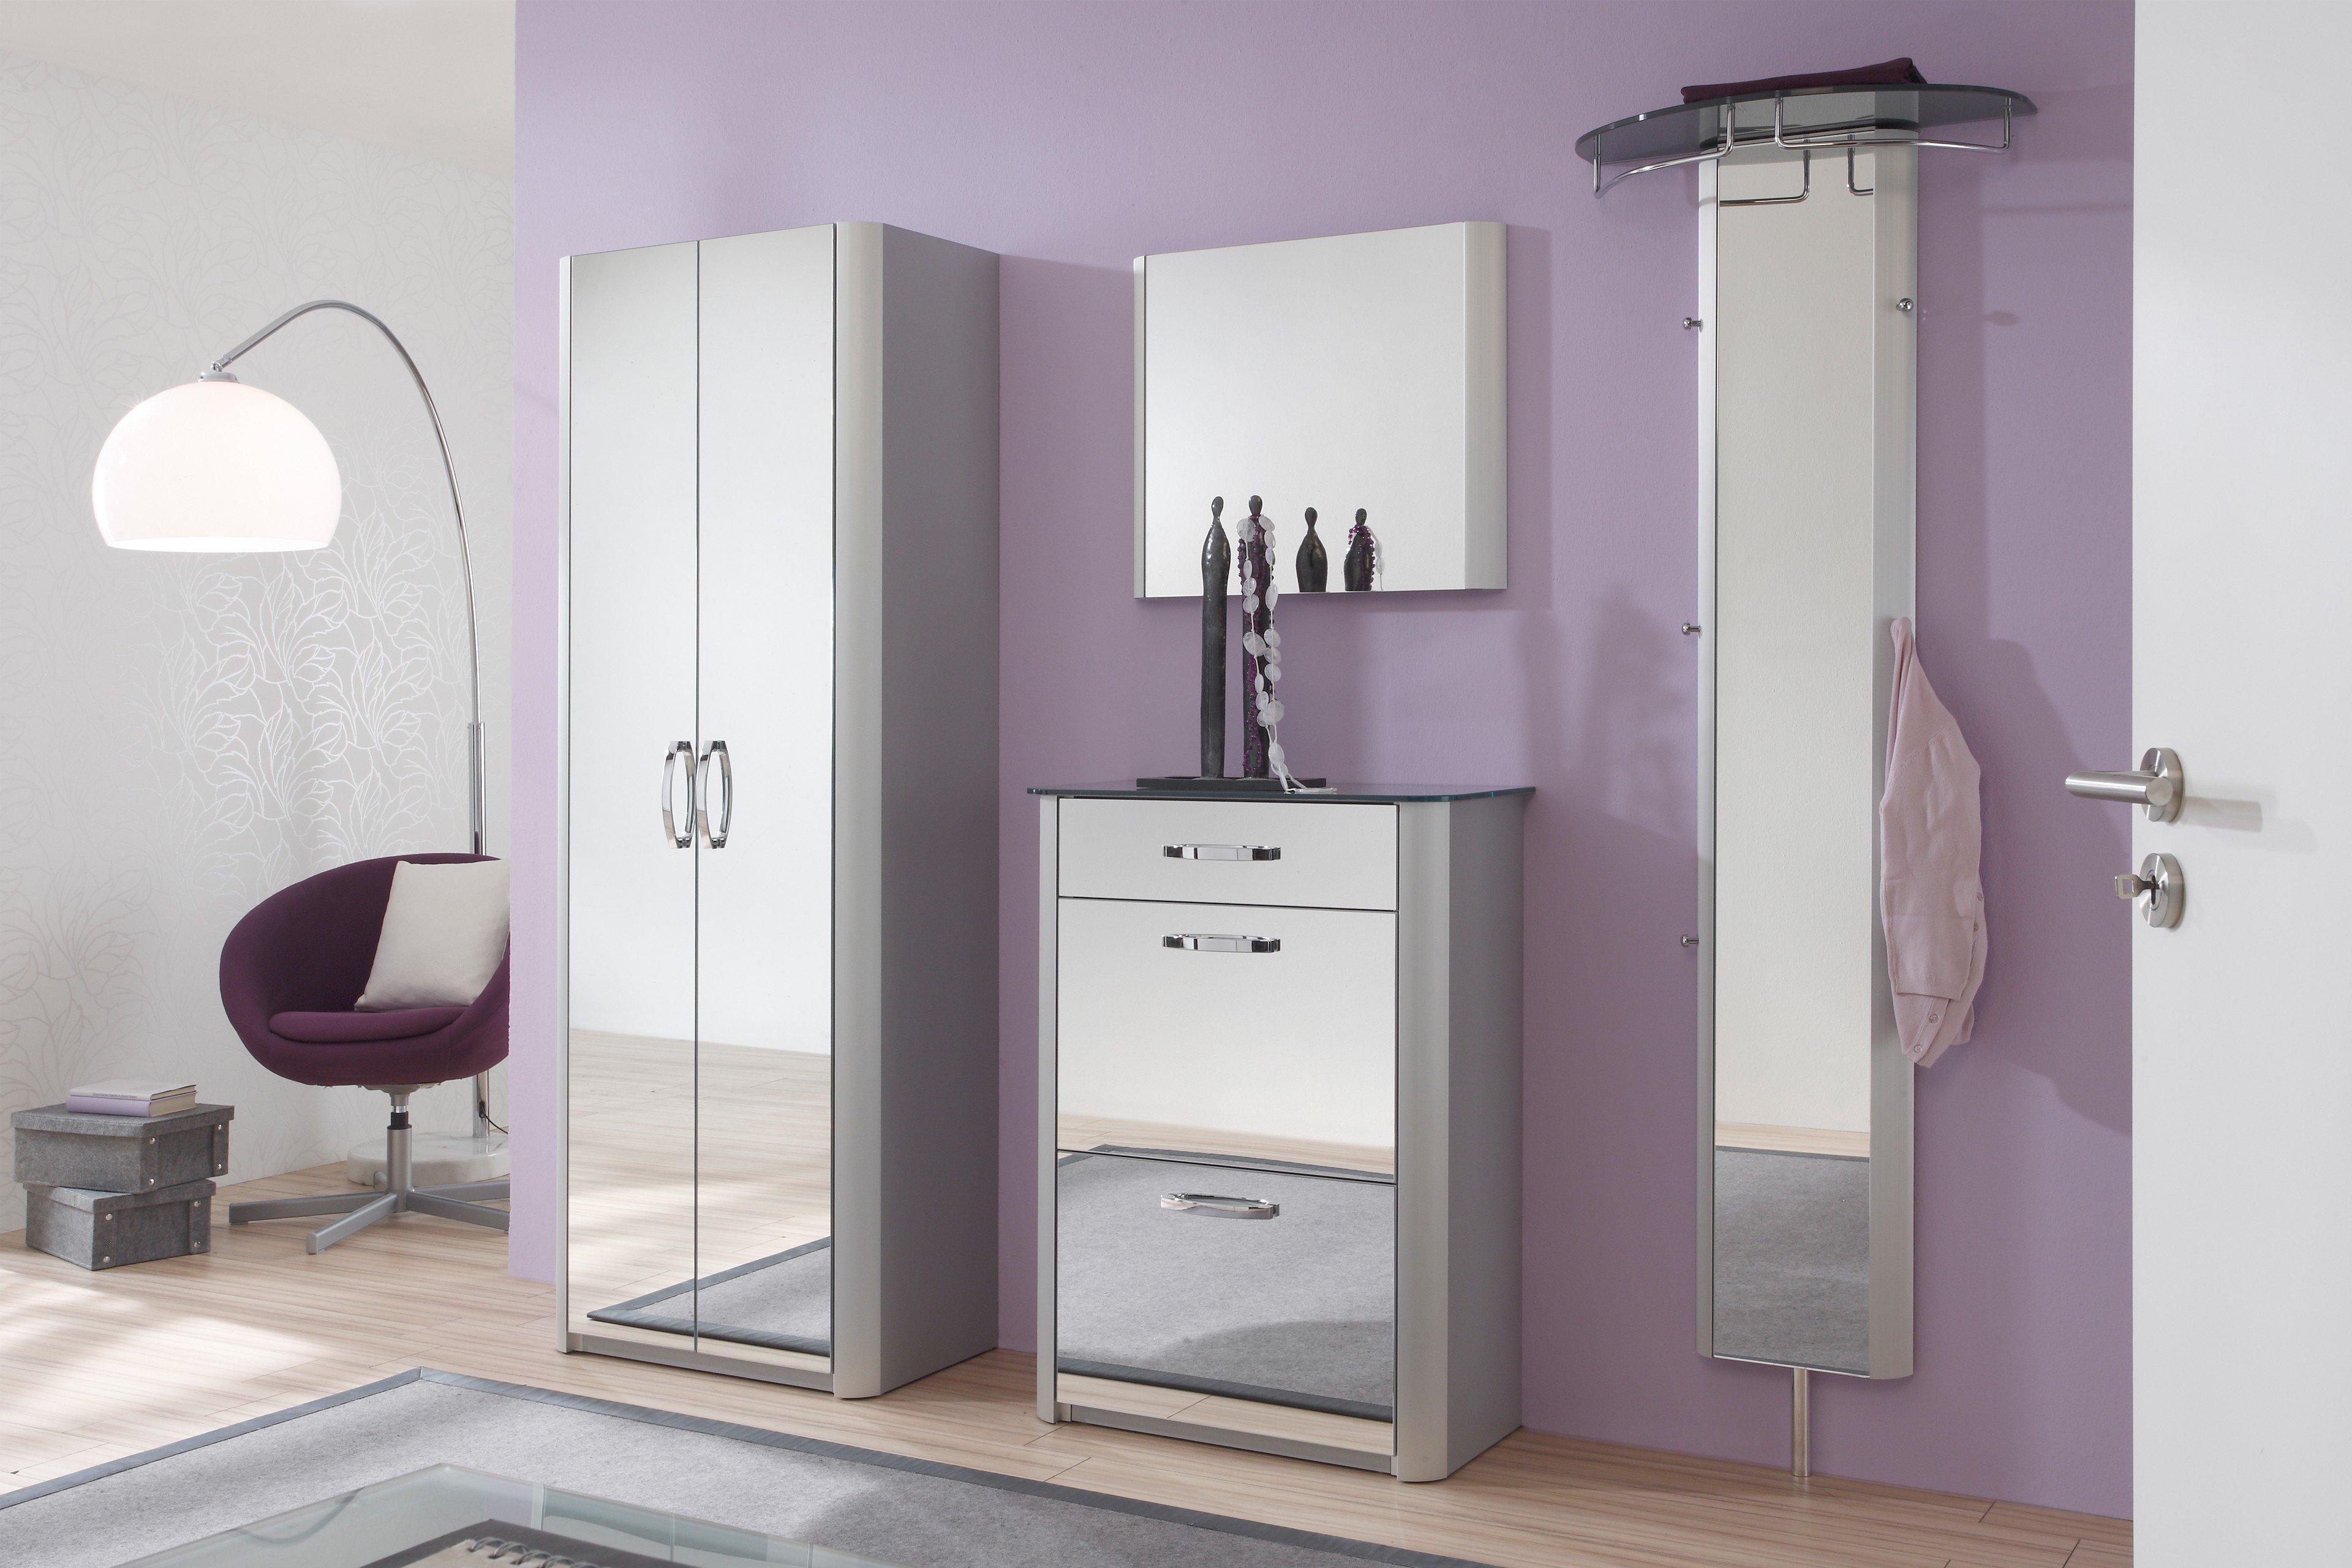 arredokit garderobe melodie mit spiegelfront m bel letz. Black Bedroom Furniture Sets. Home Design Ideas